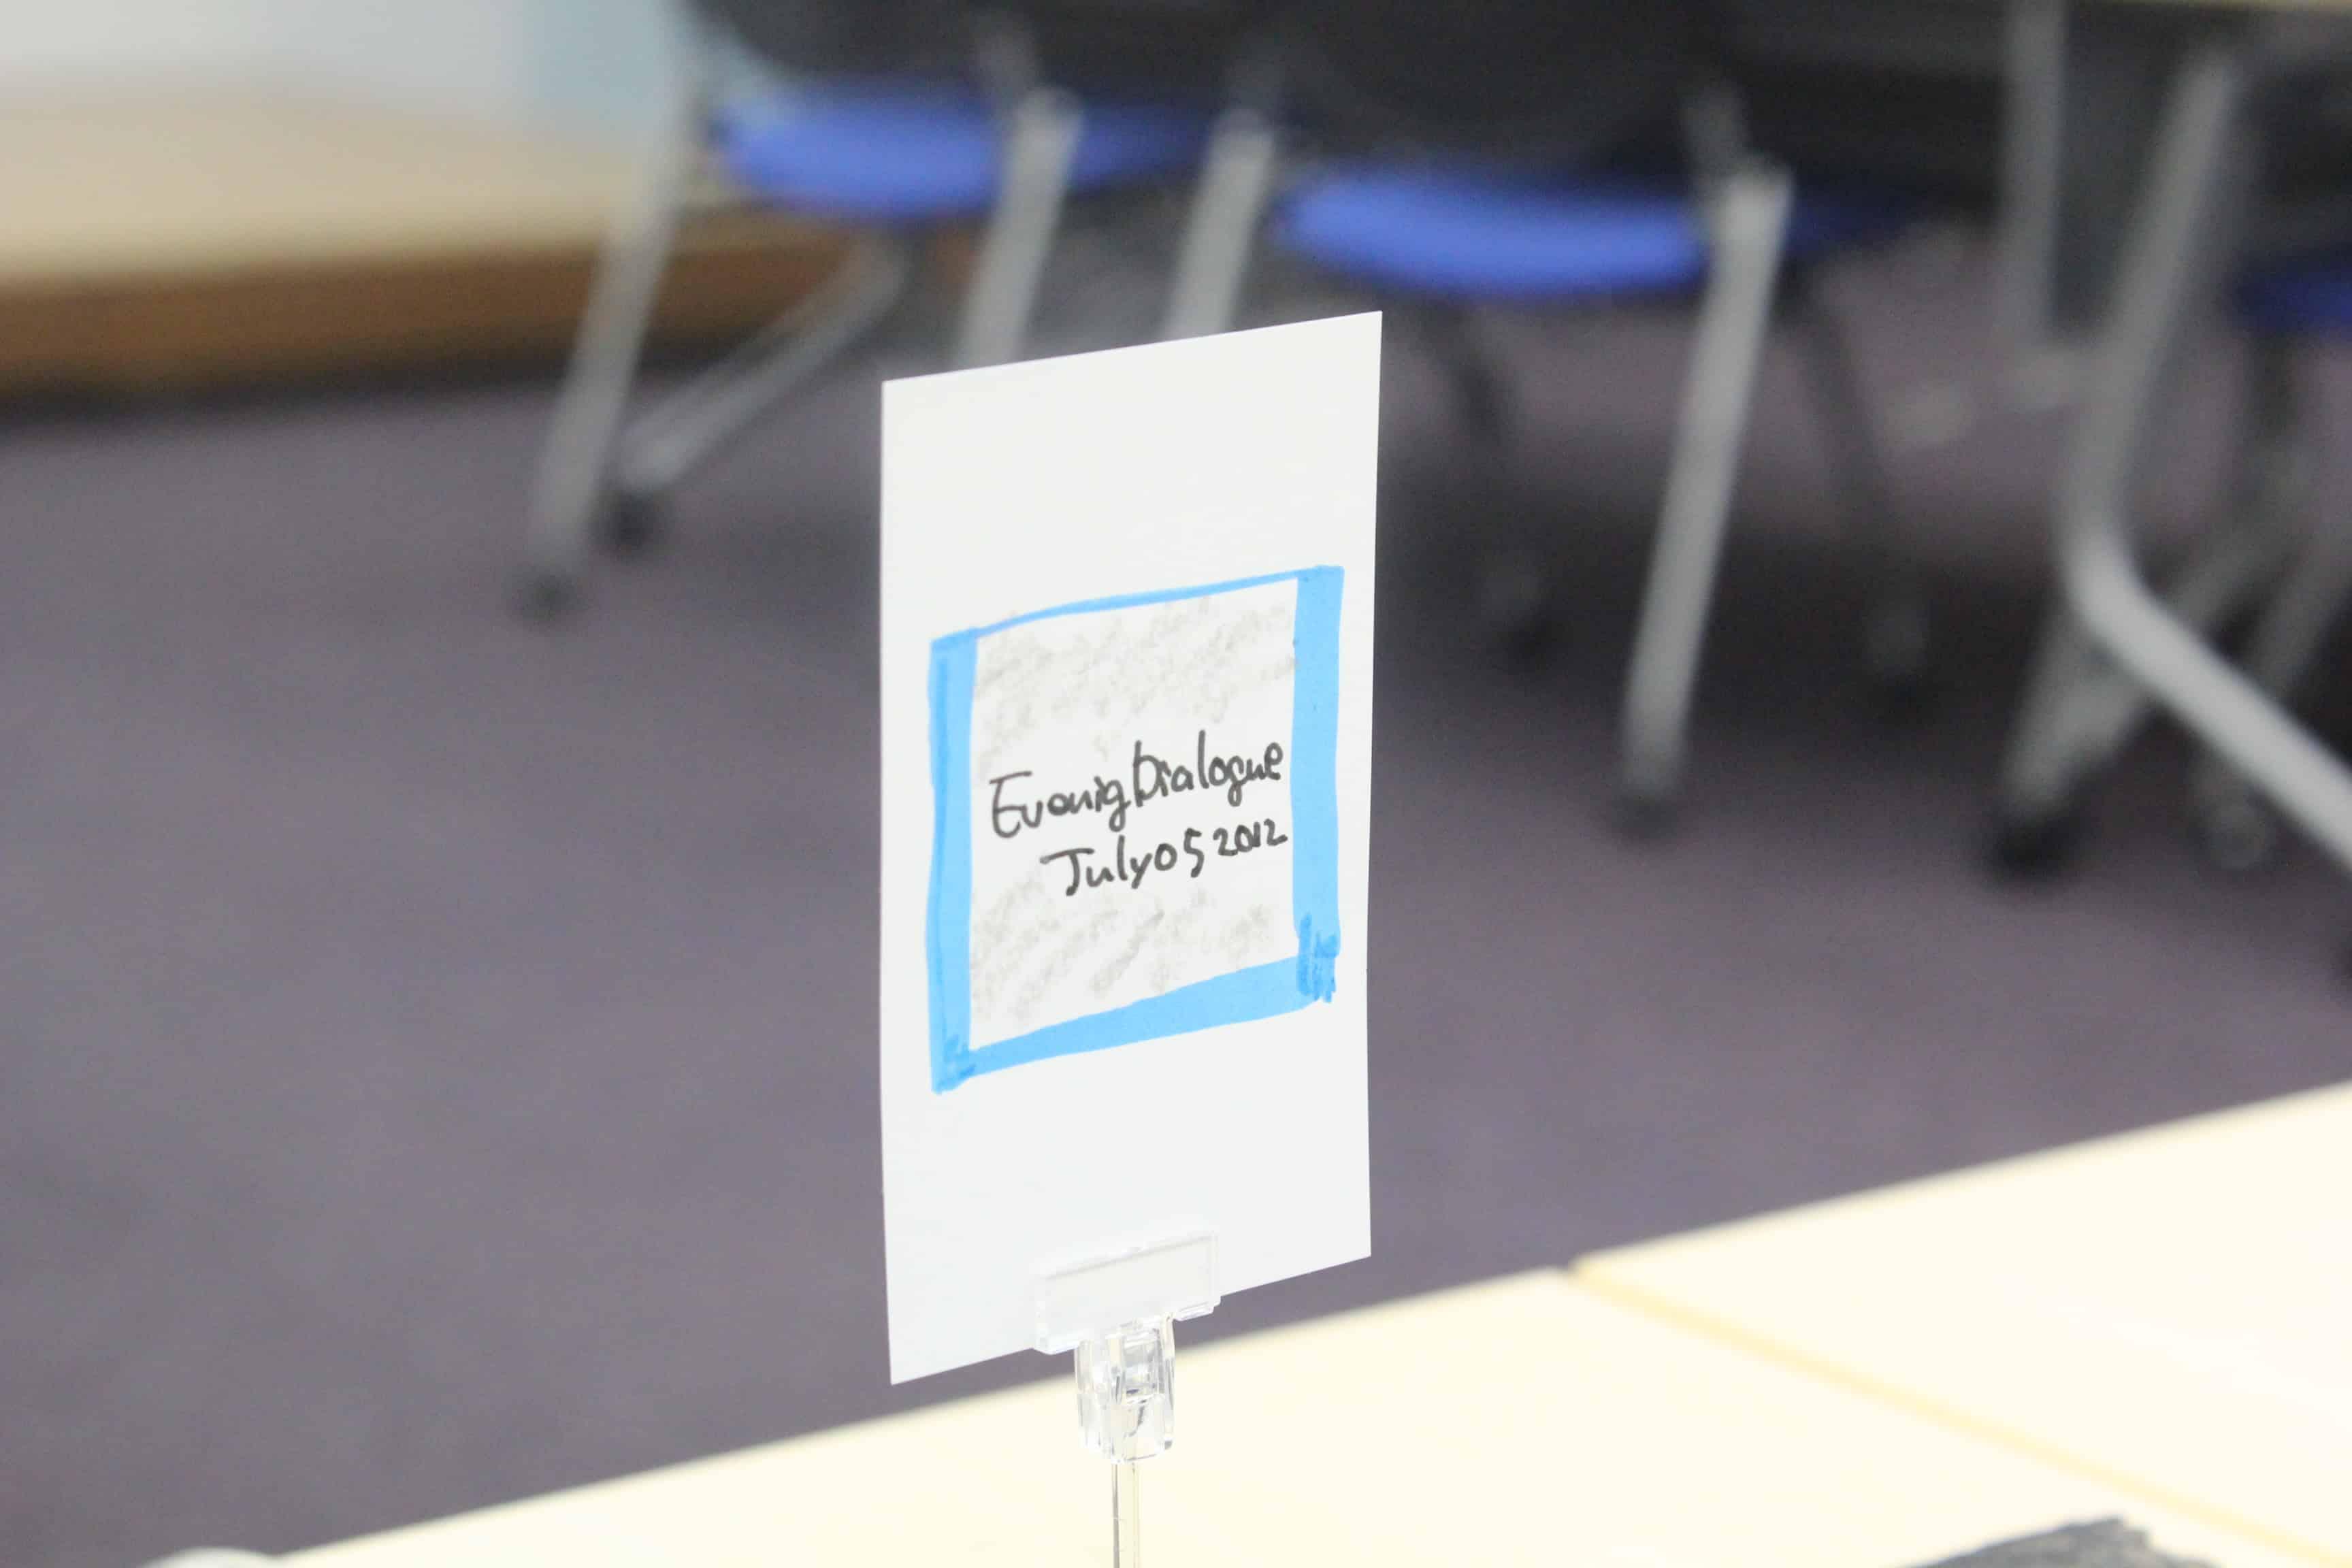 IMG 3052 - 産業能率大学大学院OBOG会「イブニングダイアローグ」に参加しました。